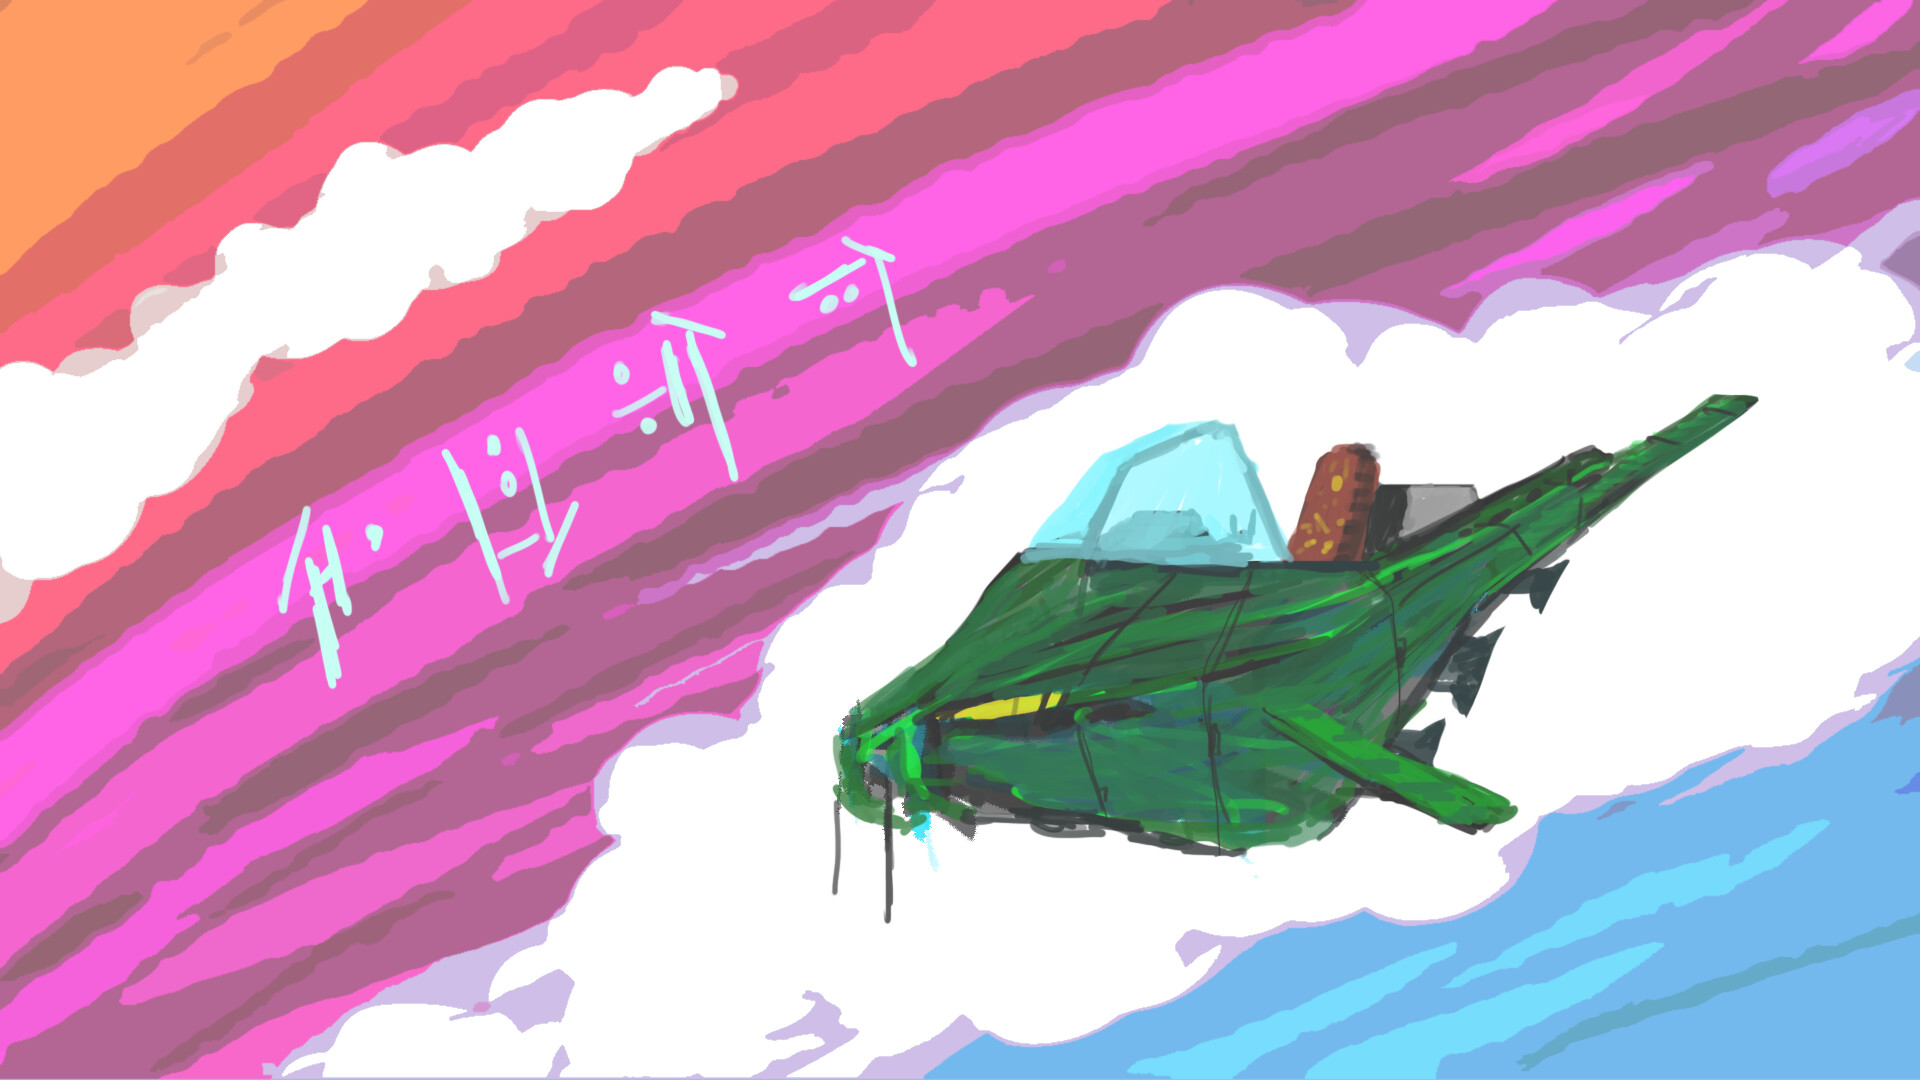 Alexander laheij ship sketch 04